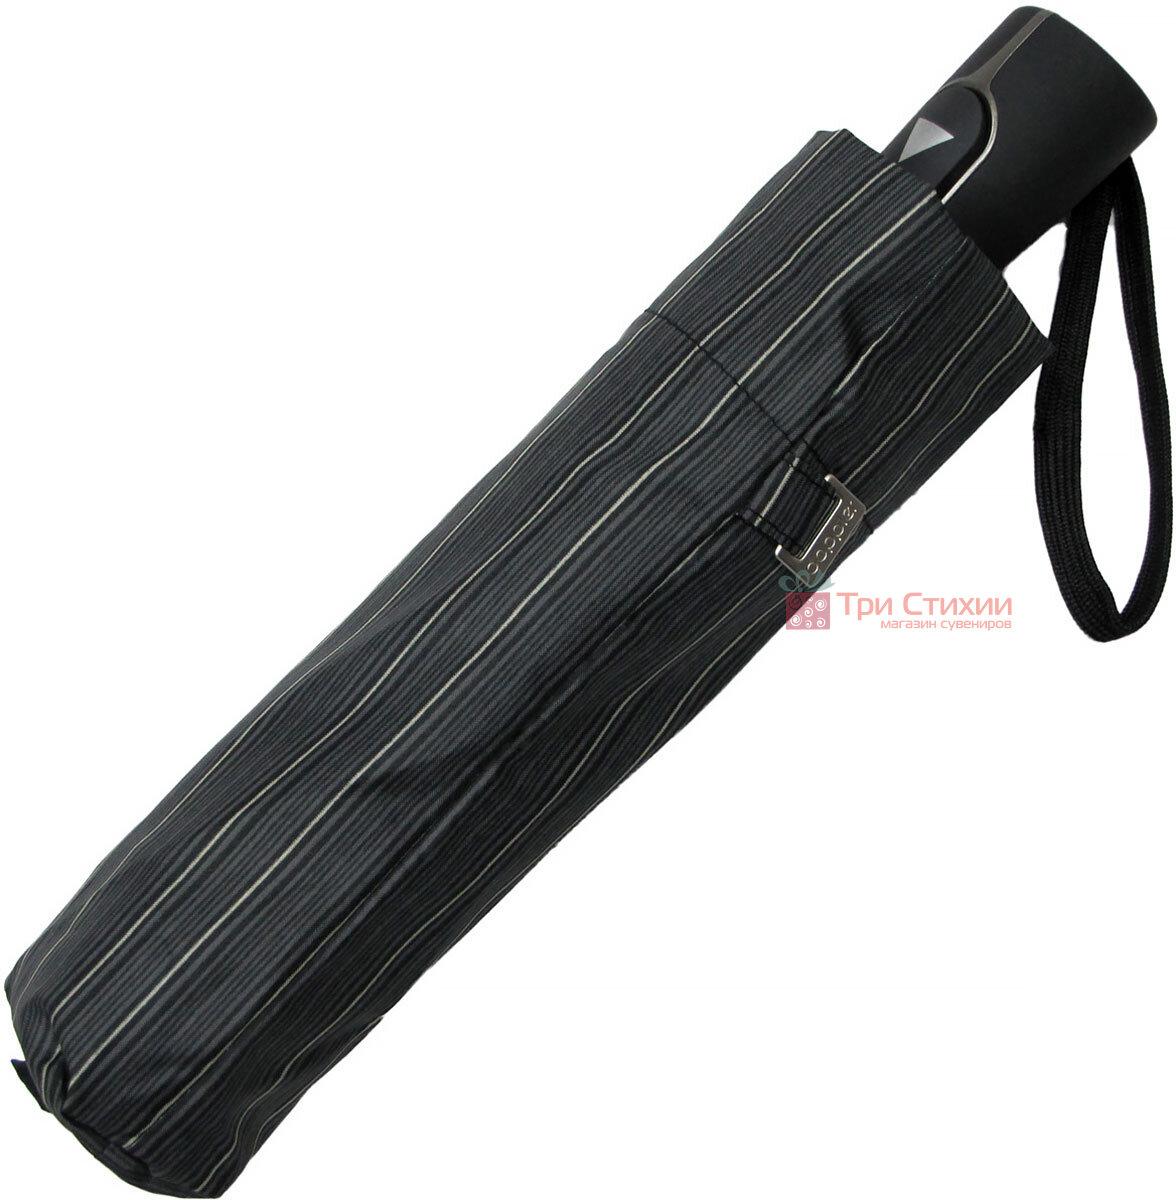 Парасоля складана Doppler Carbon 730167-4 напівавтомат Сіра в дрібну смужку, фото 5